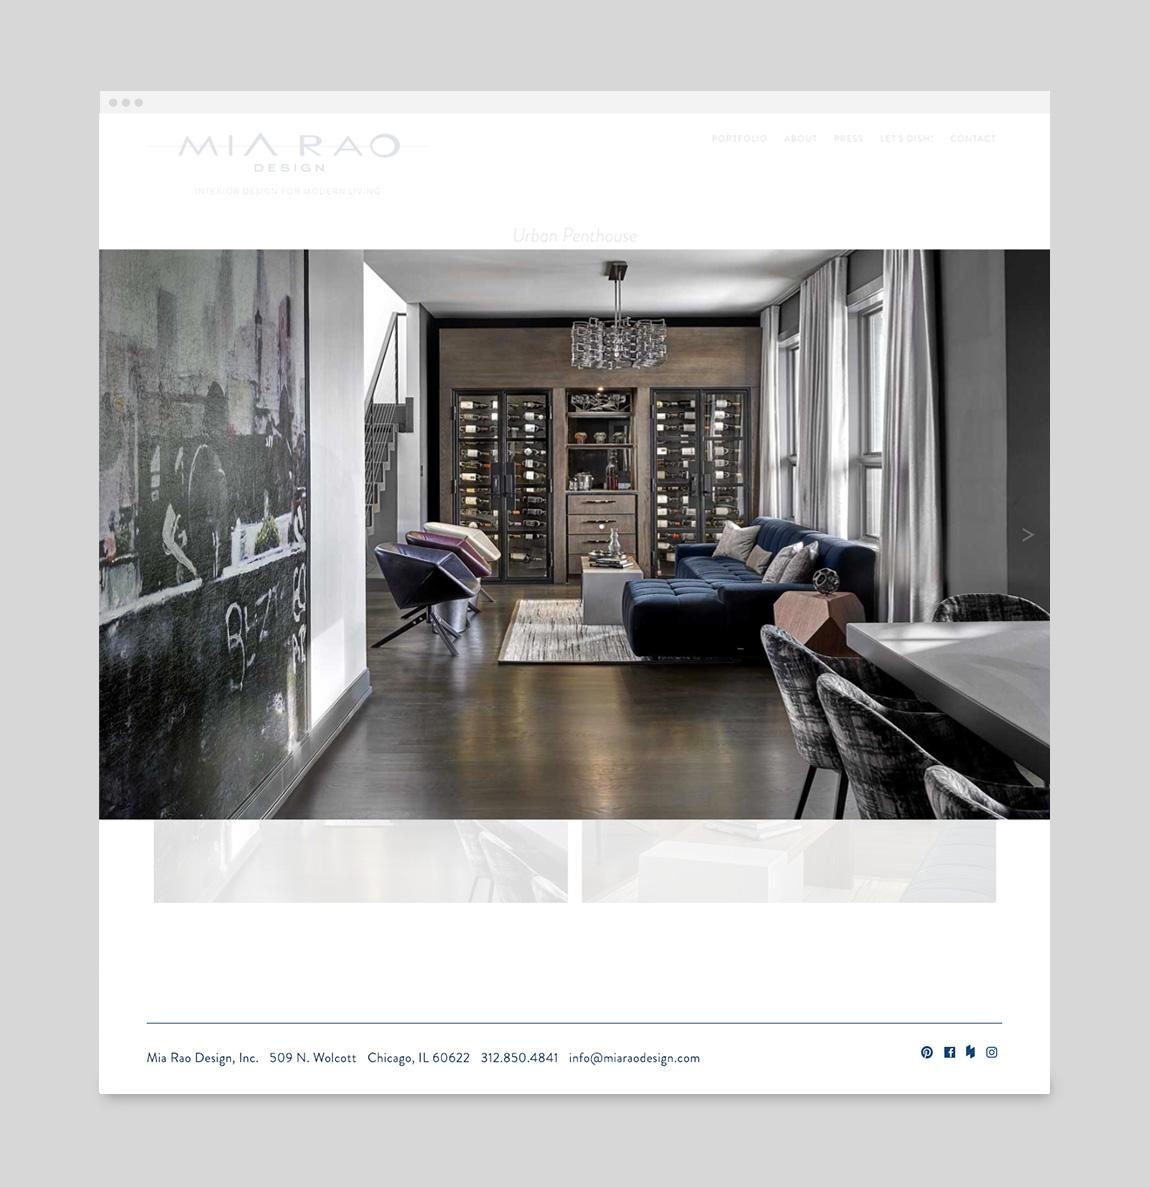 Mia Rao Design Website Single Project Page by Hughes Design